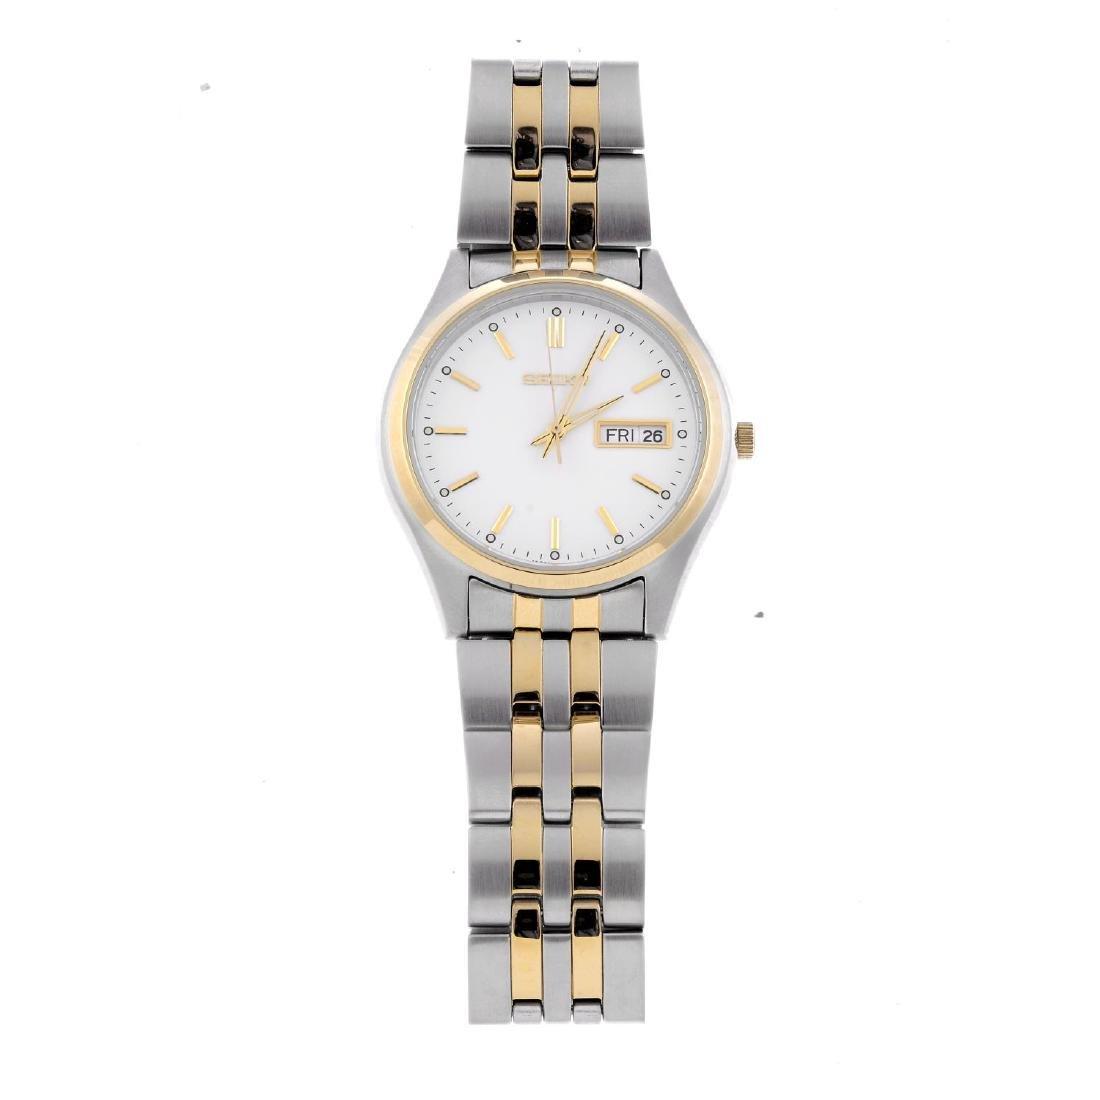 SEIKO - a gentleman's bracelet watch. Stainless steel